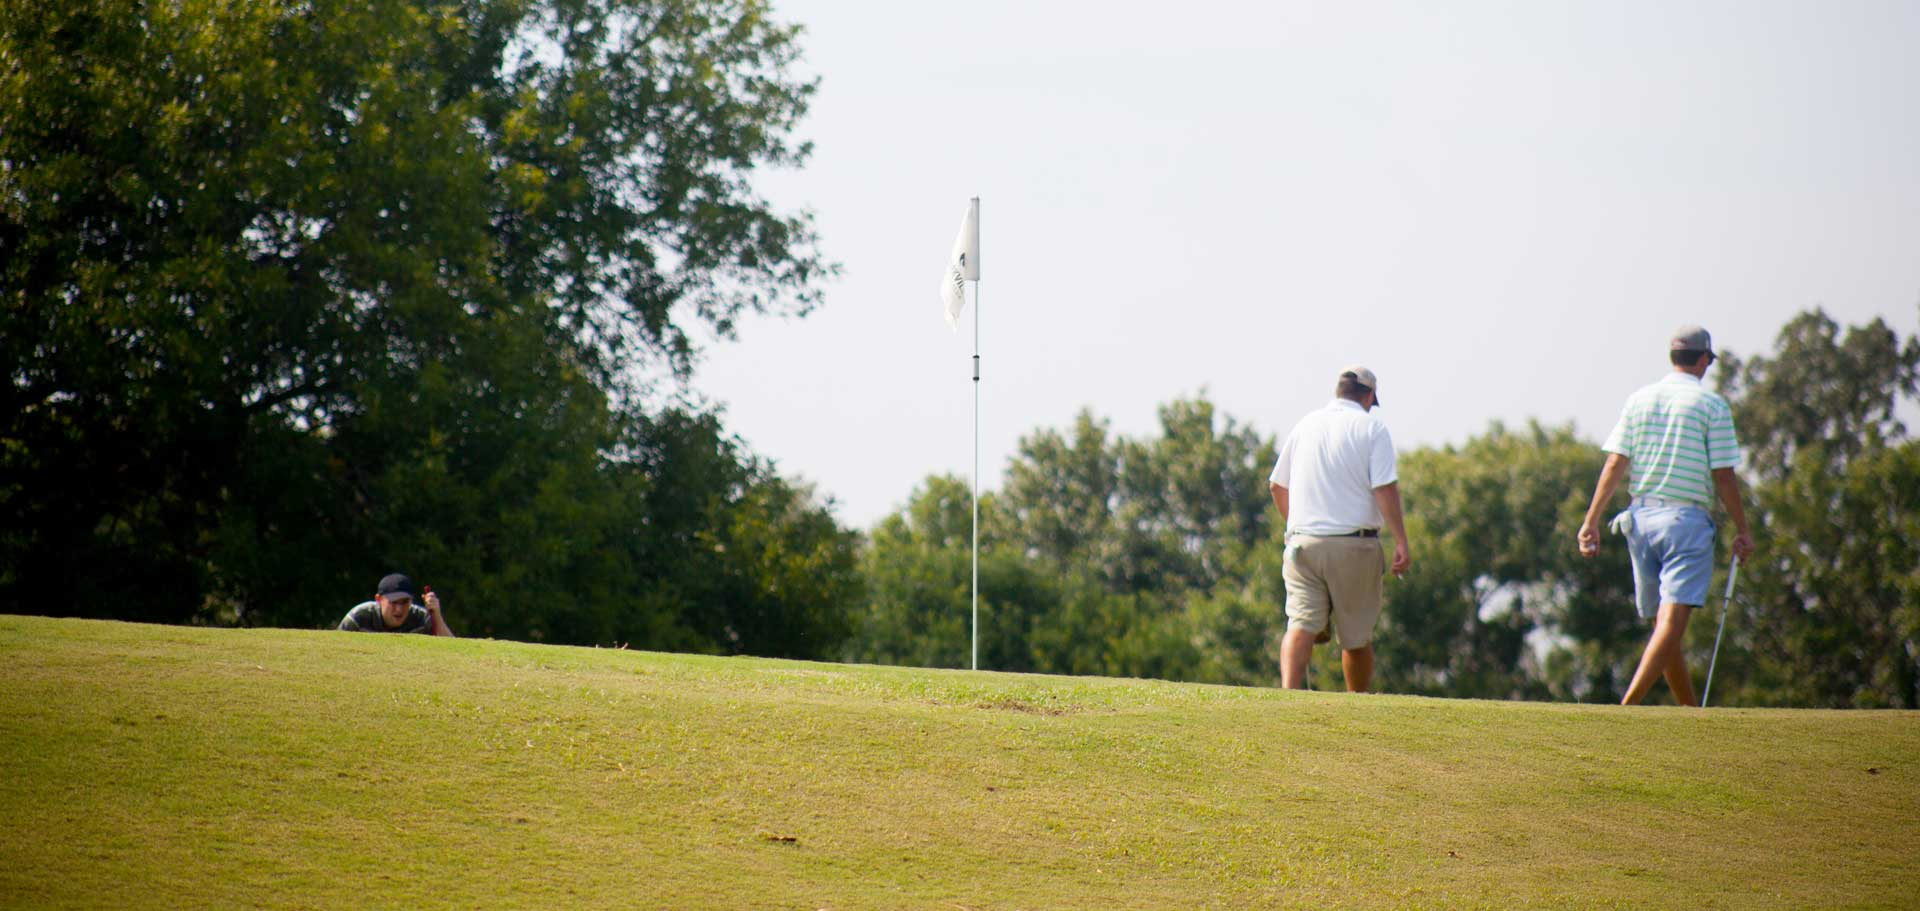 golf people green